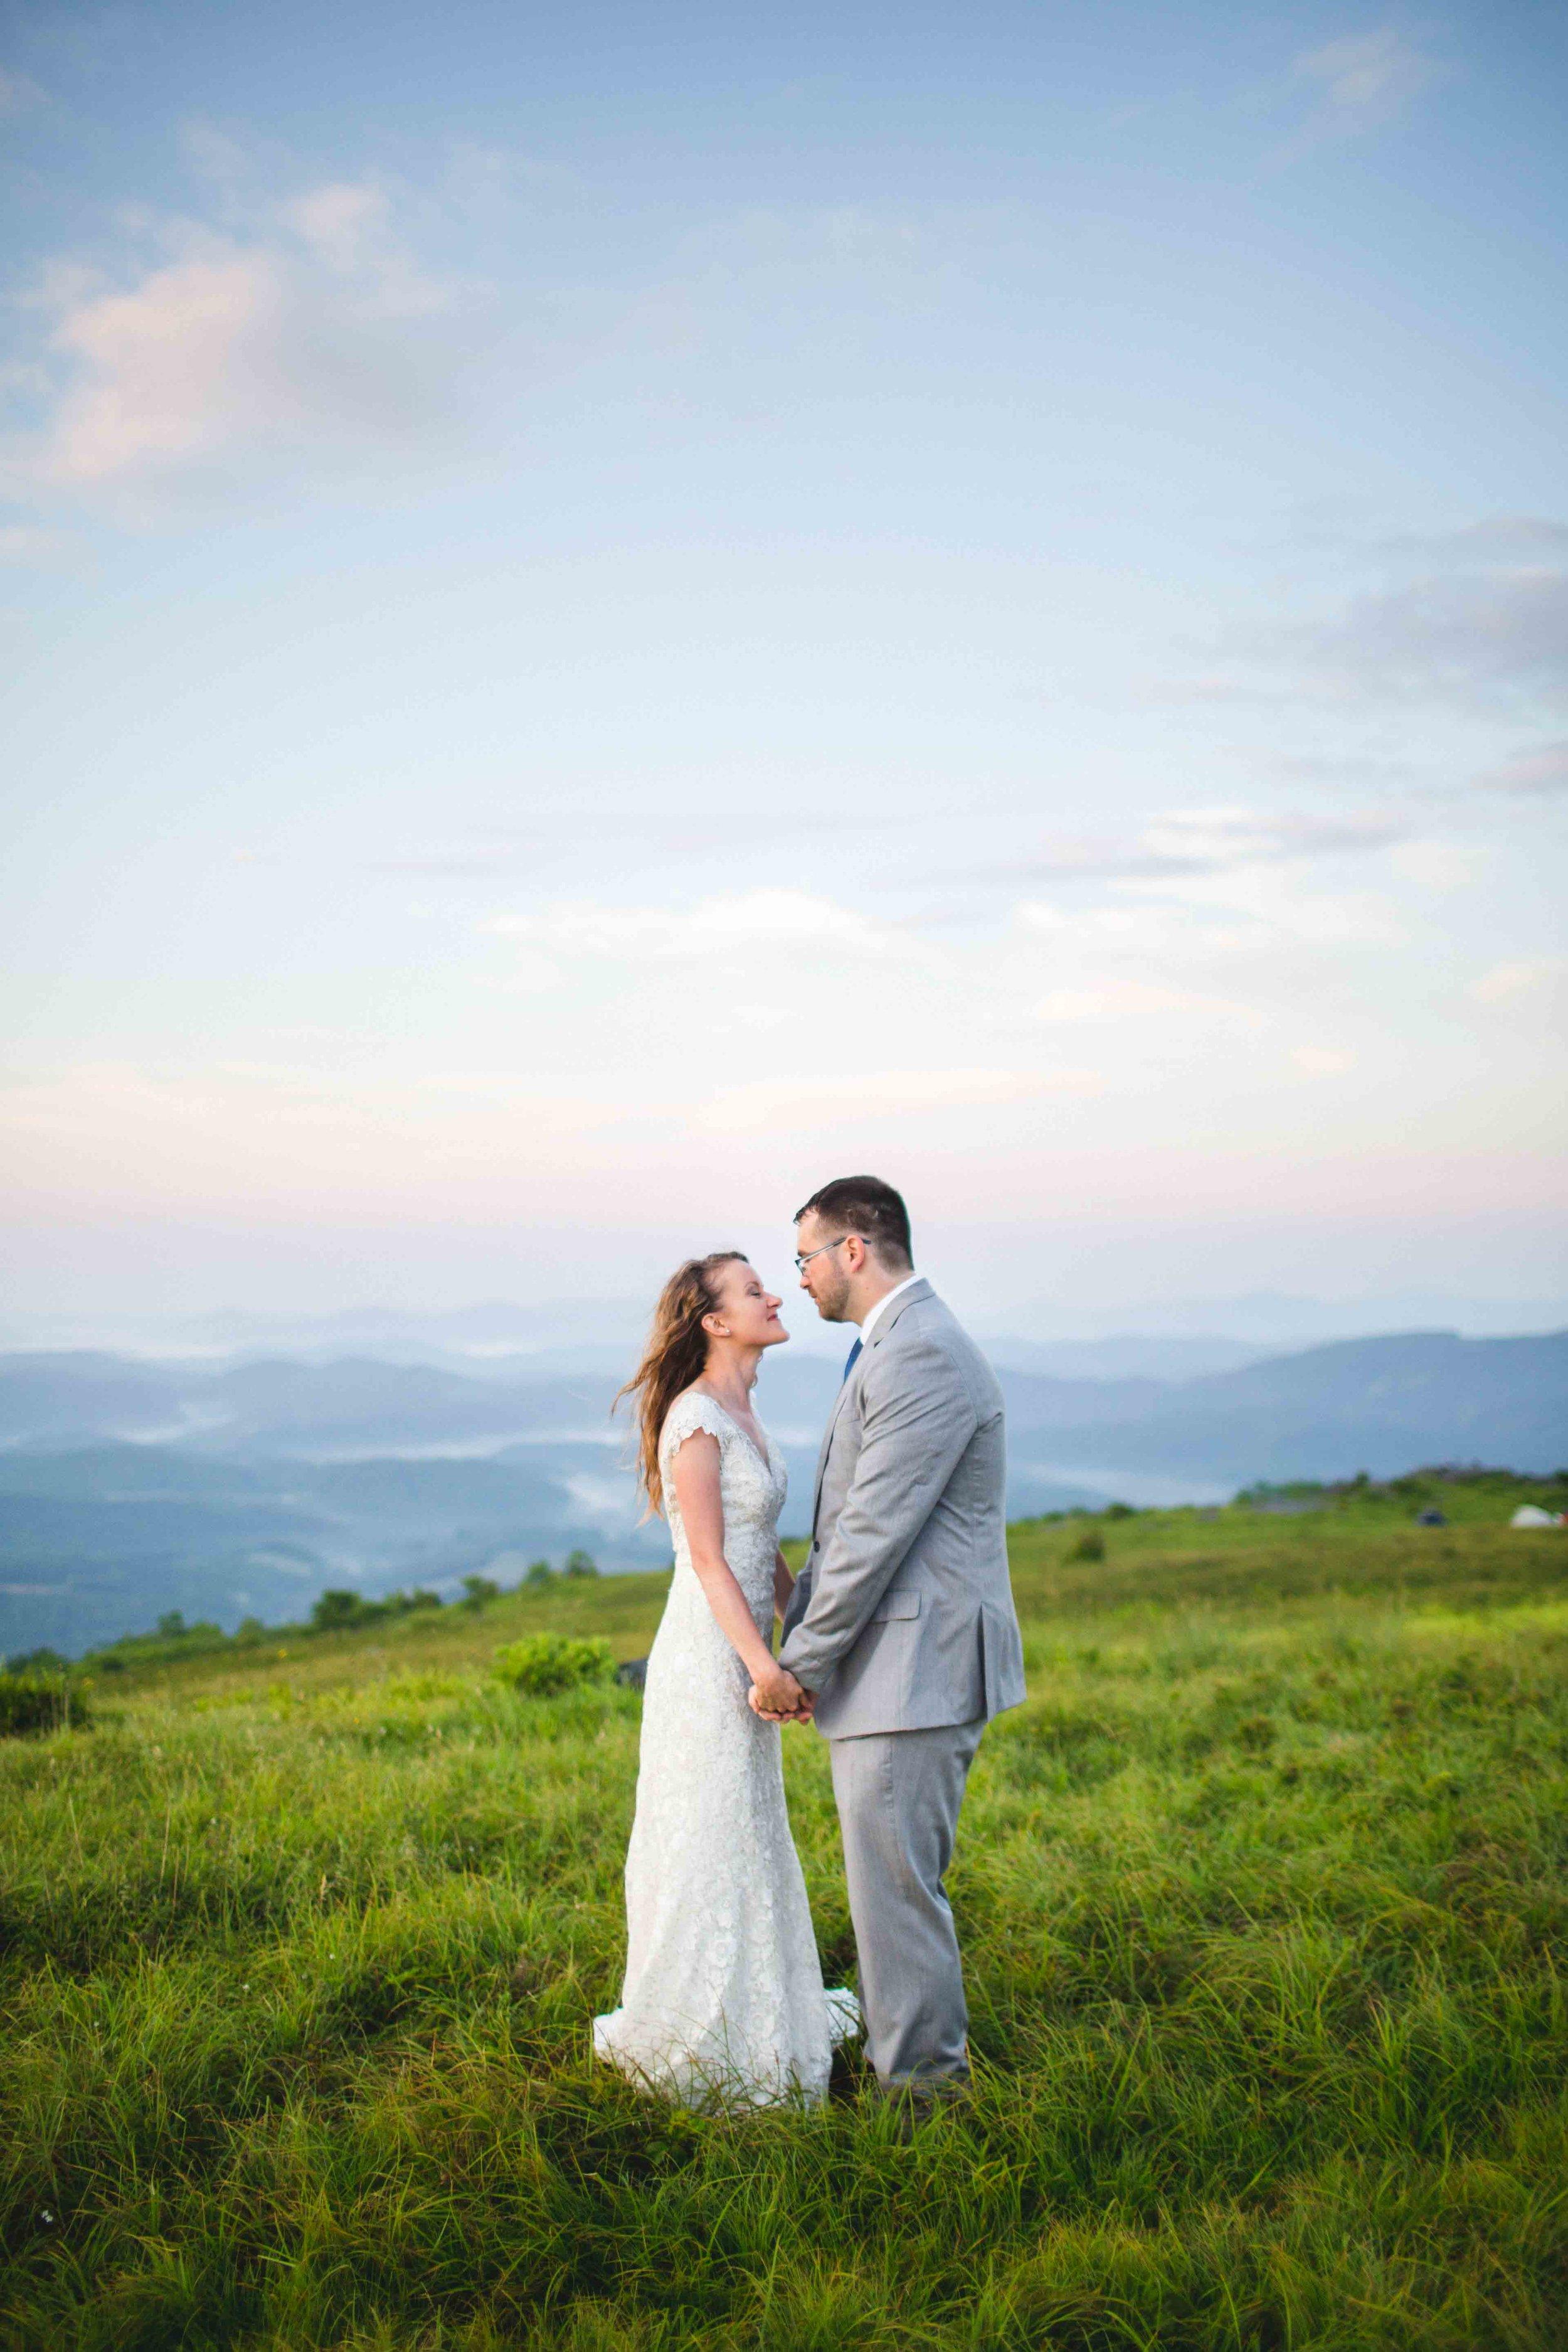 north-carolina-elopement-photographer-1-3.jpg